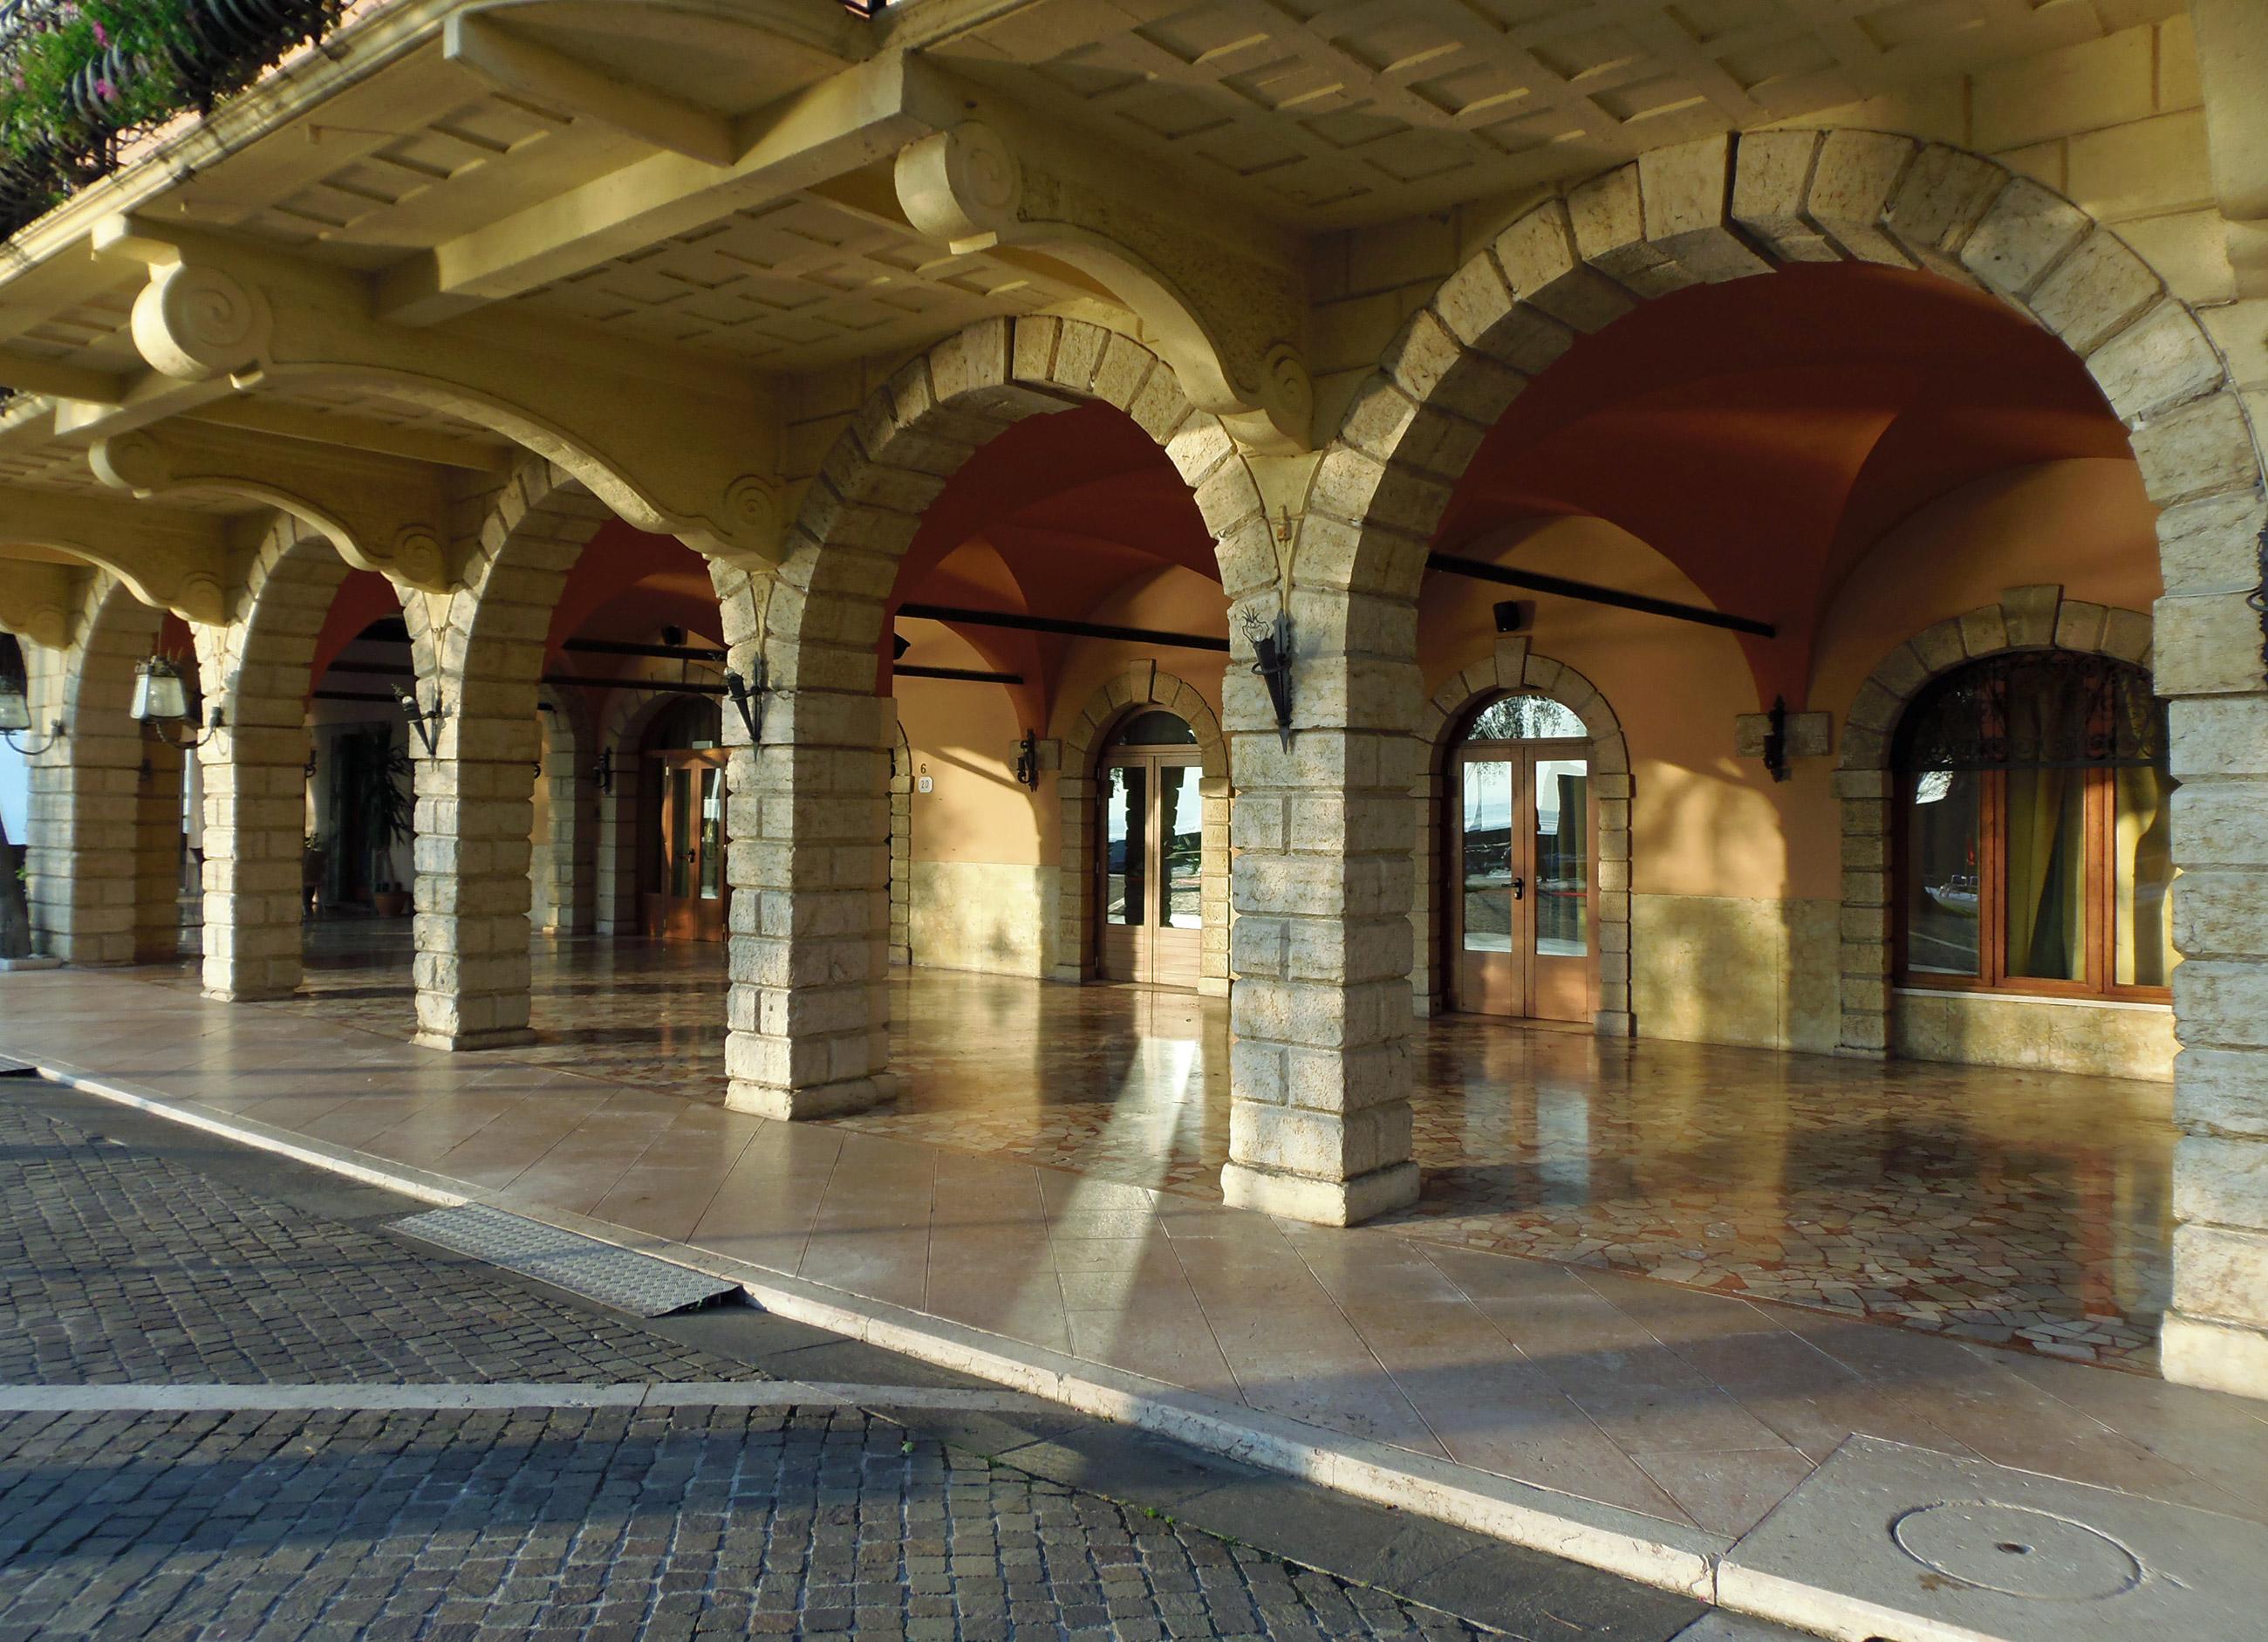 An archway passage in Torri del Benaco, Italy